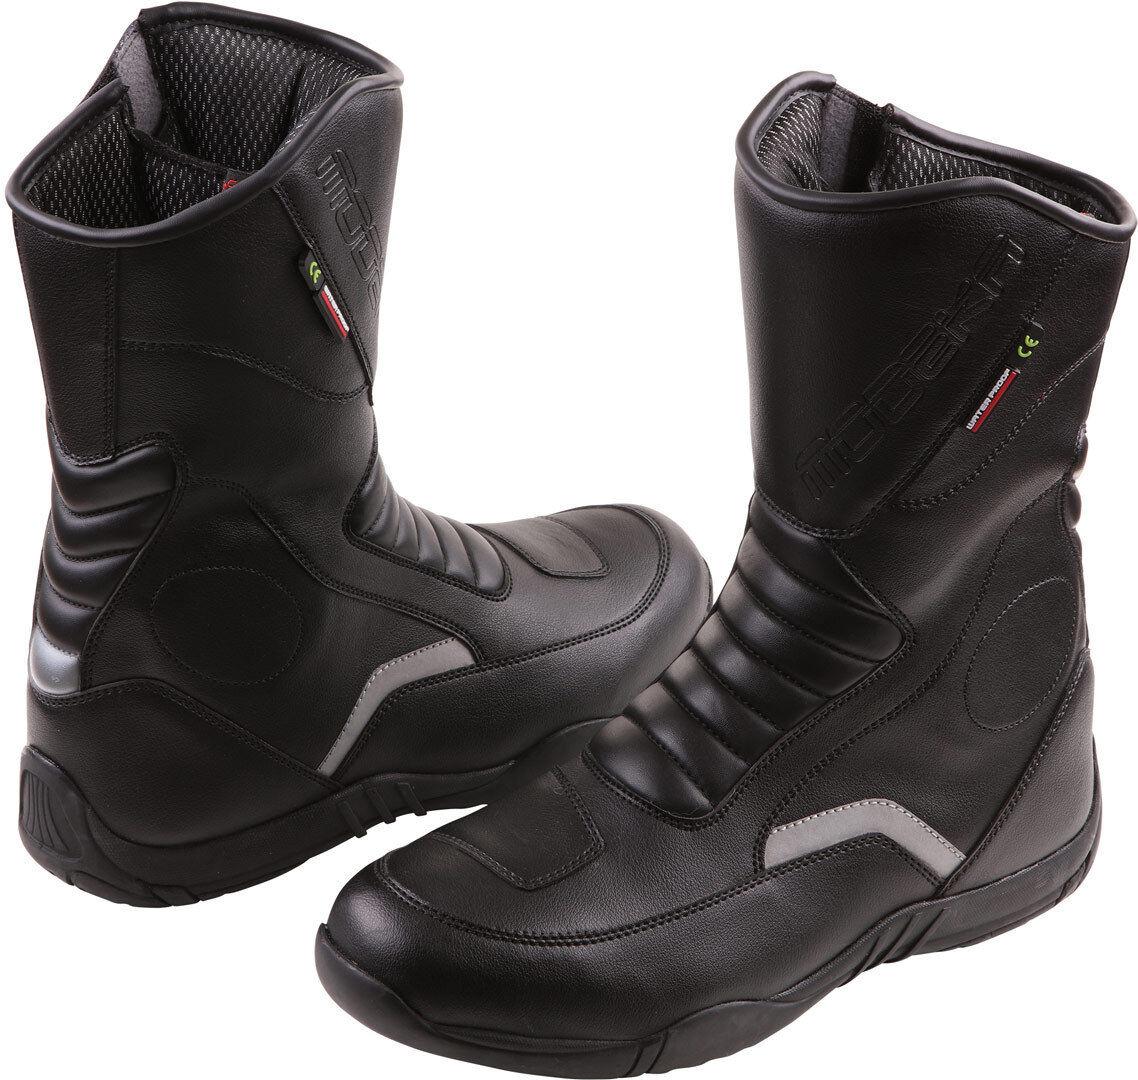 Modeka Blaker Motorcycle Boots Black 42